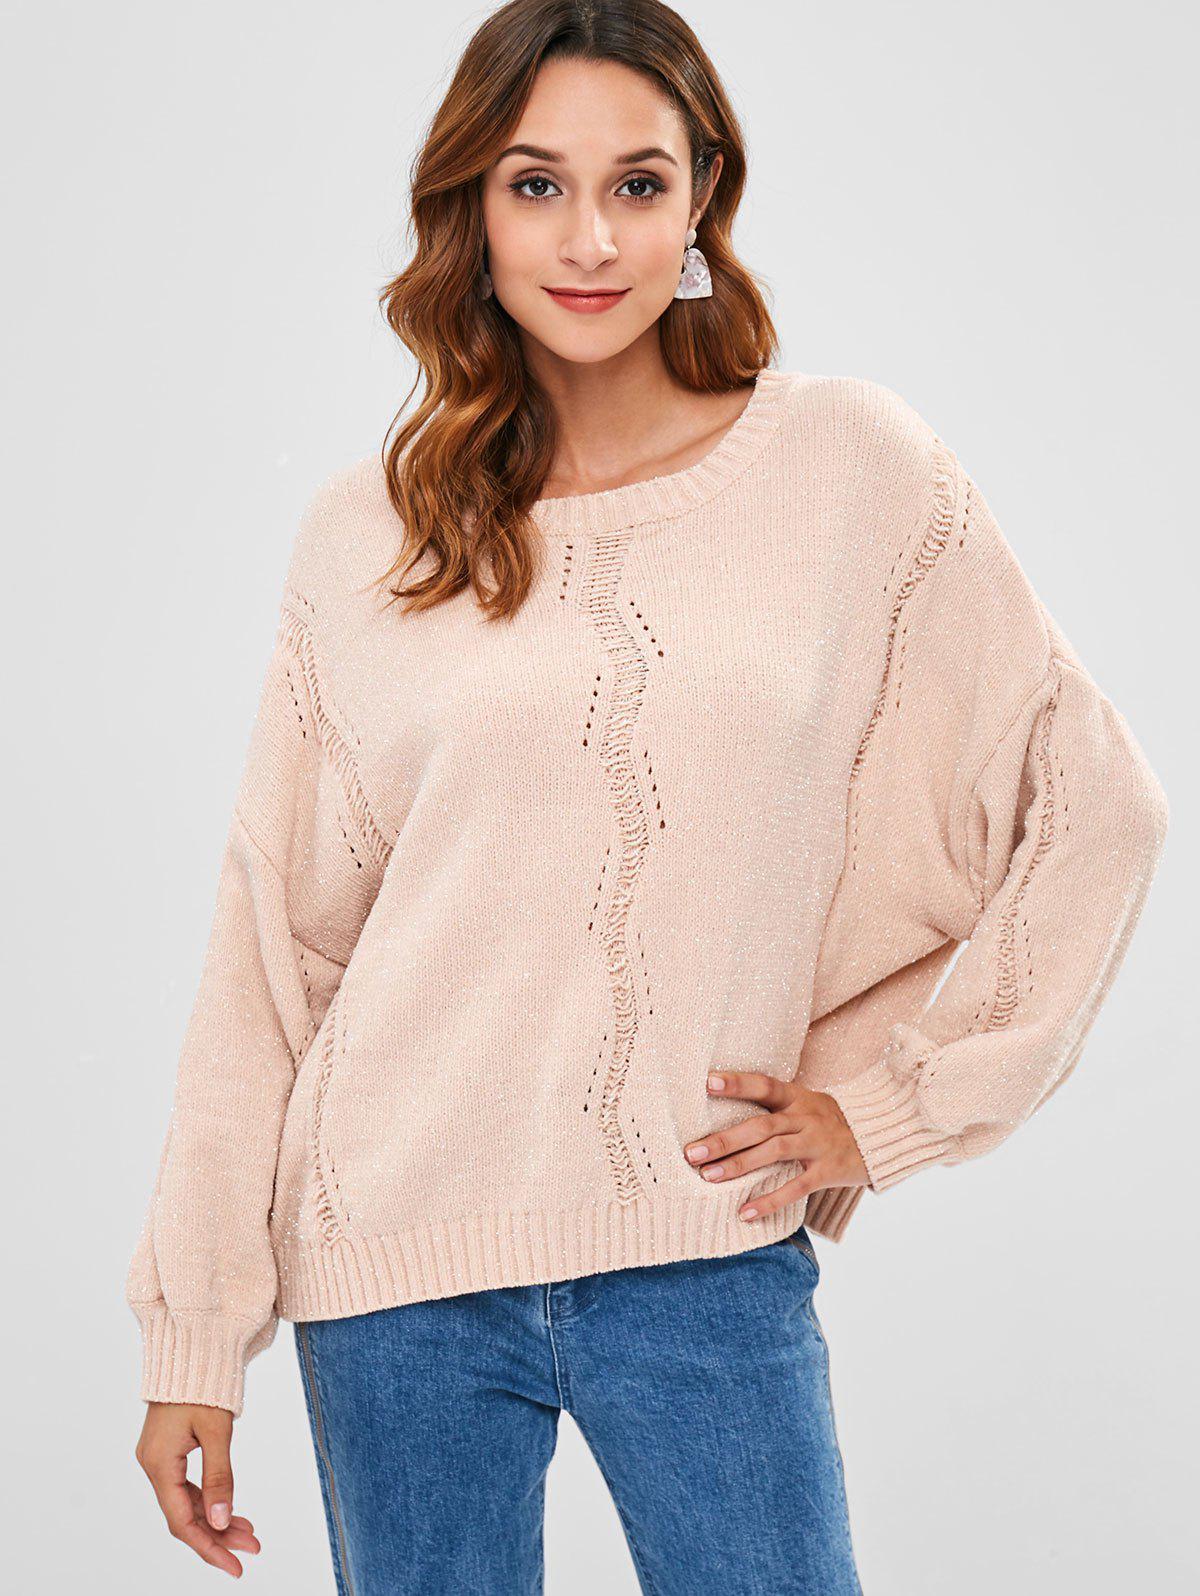 ZAFUL Drop Shoulder Shining Detail Pullover Sweater, Pink